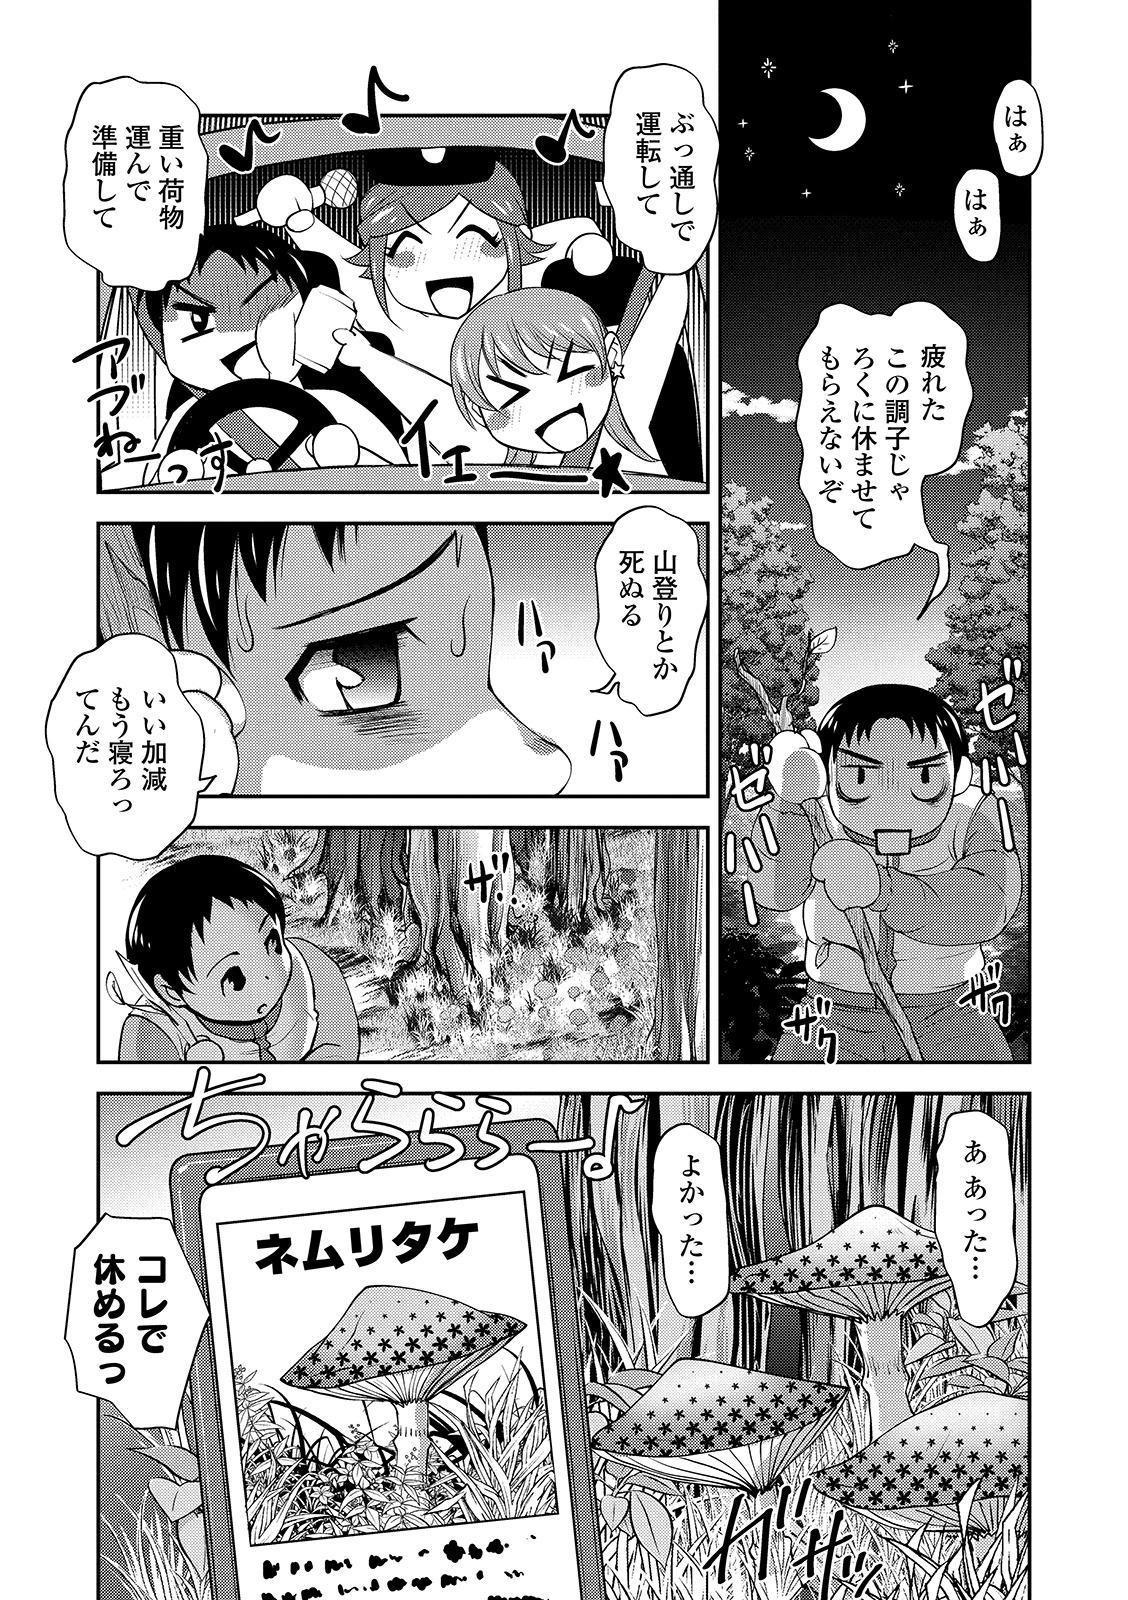 COMIC Shigekiteki SQUIRT!! Vol. 15 151